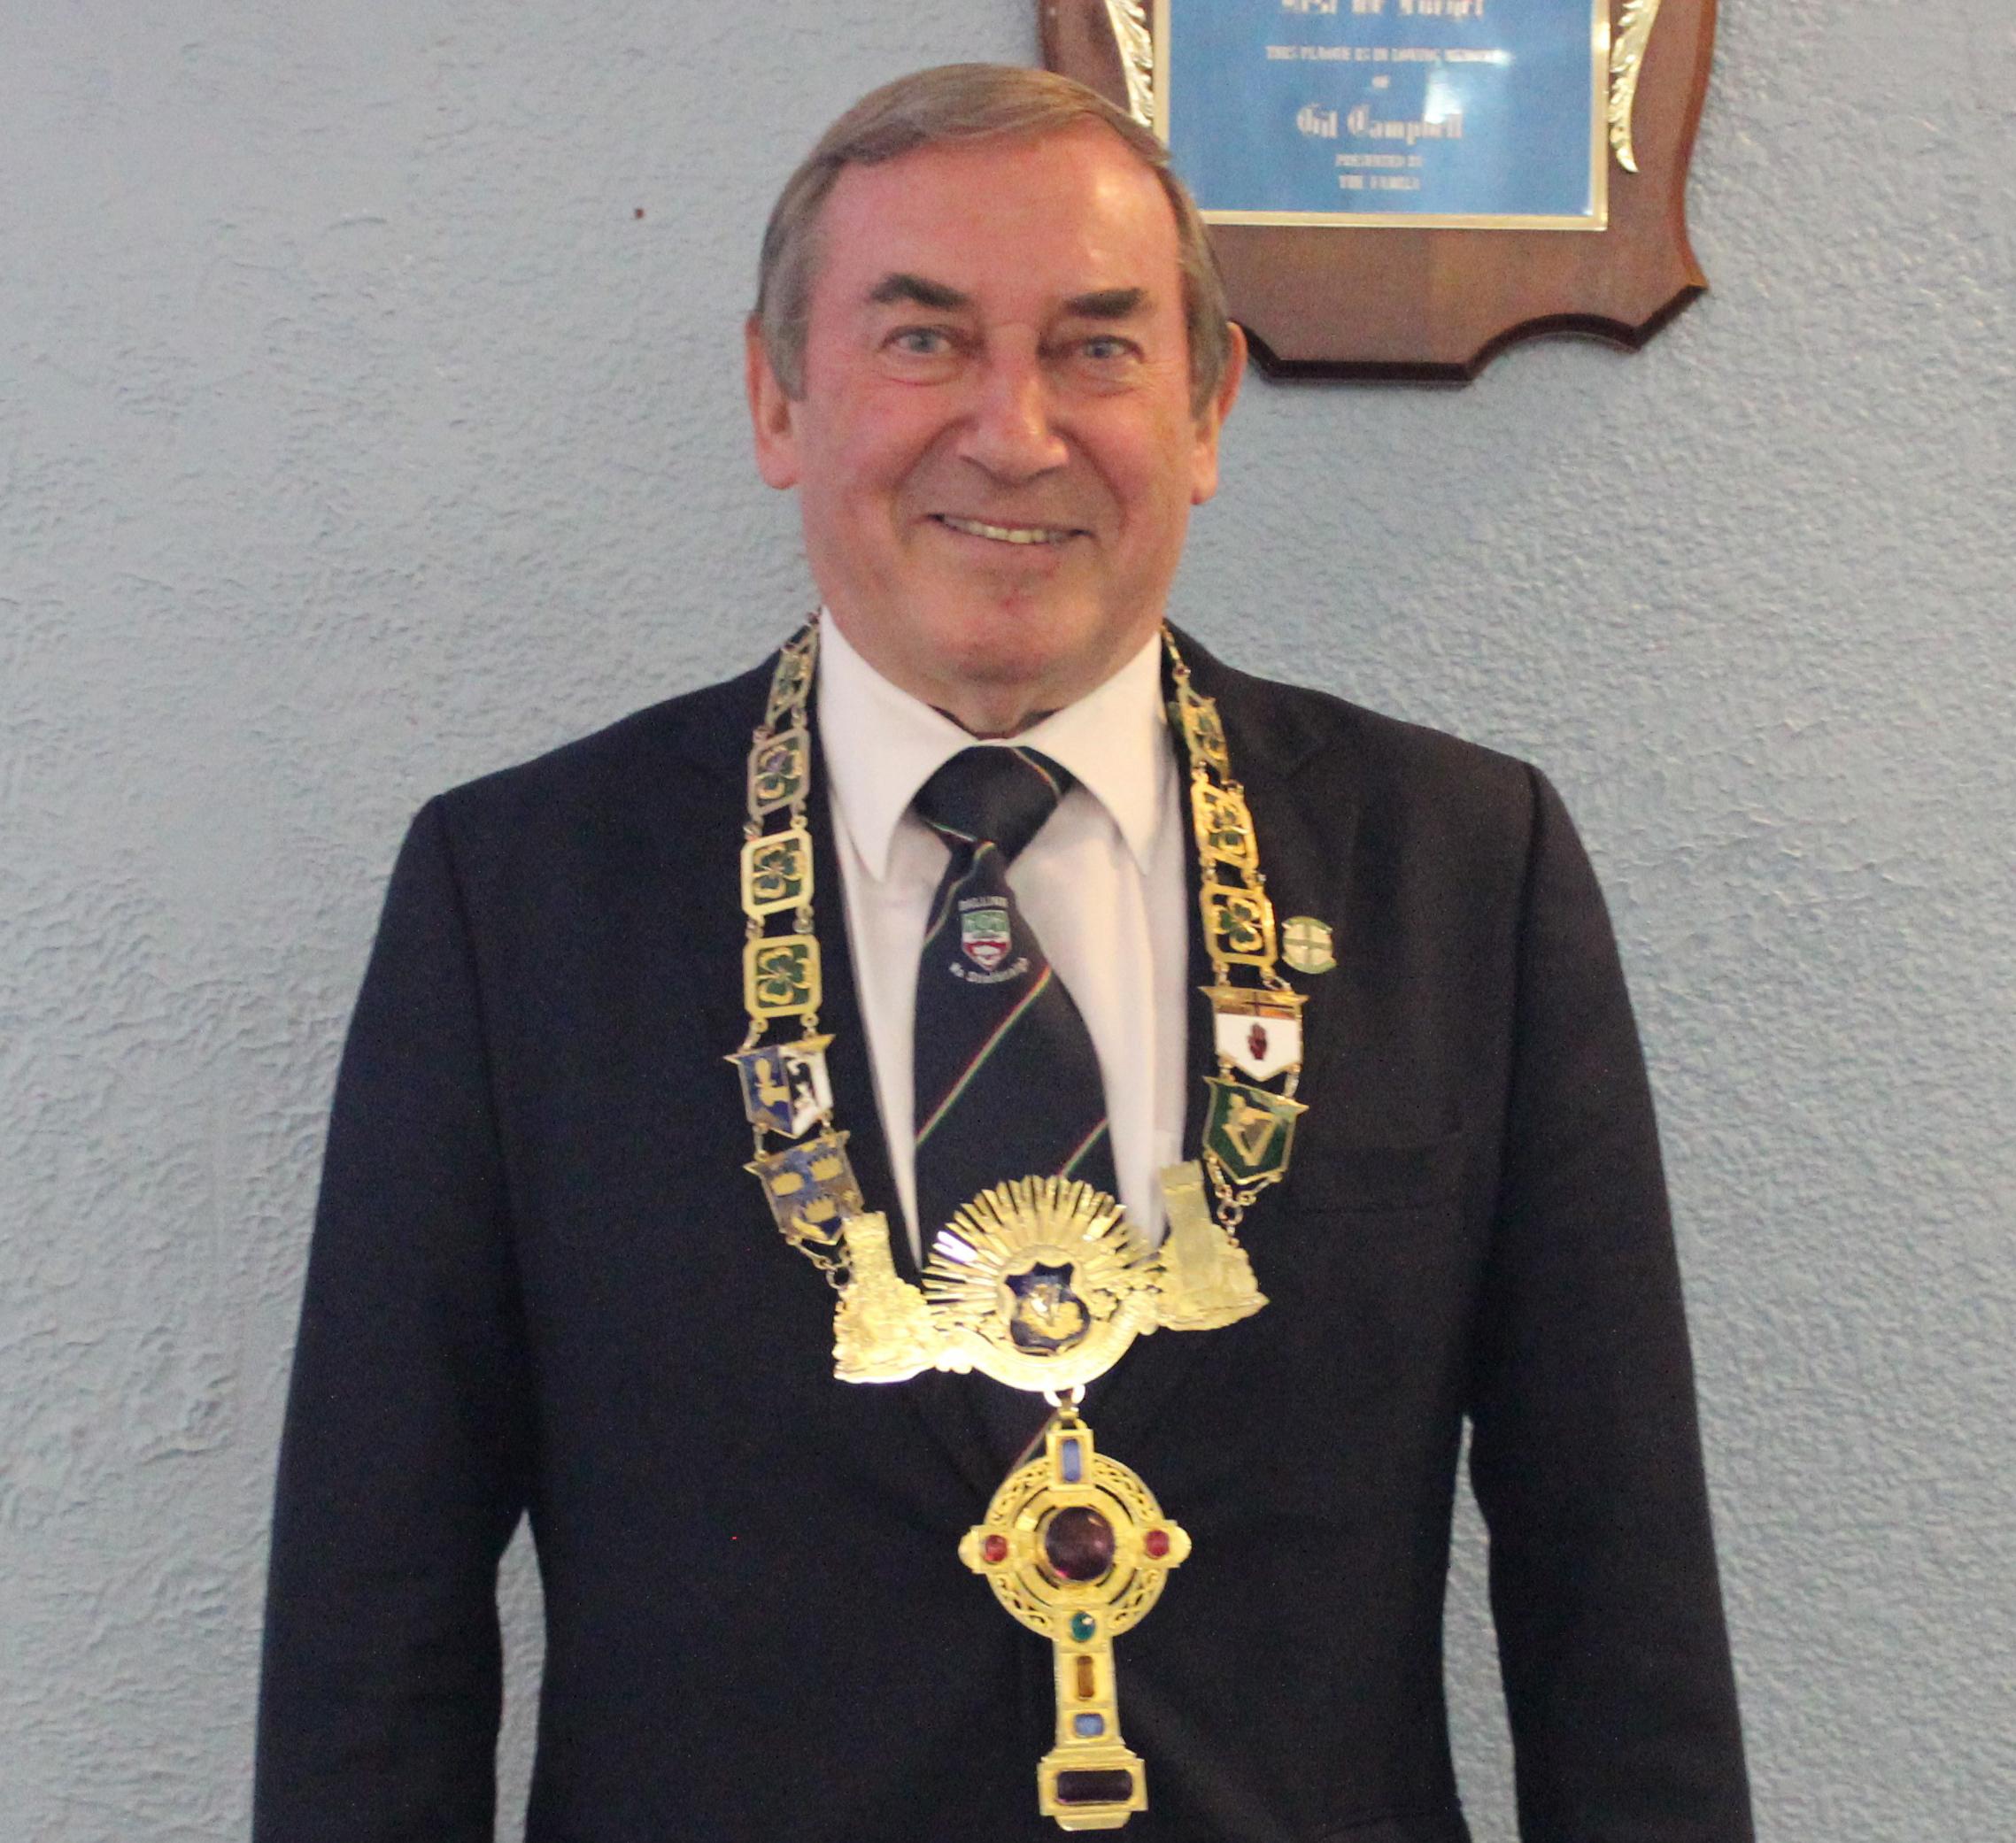 United Irish Societies of Montreal Elects New President